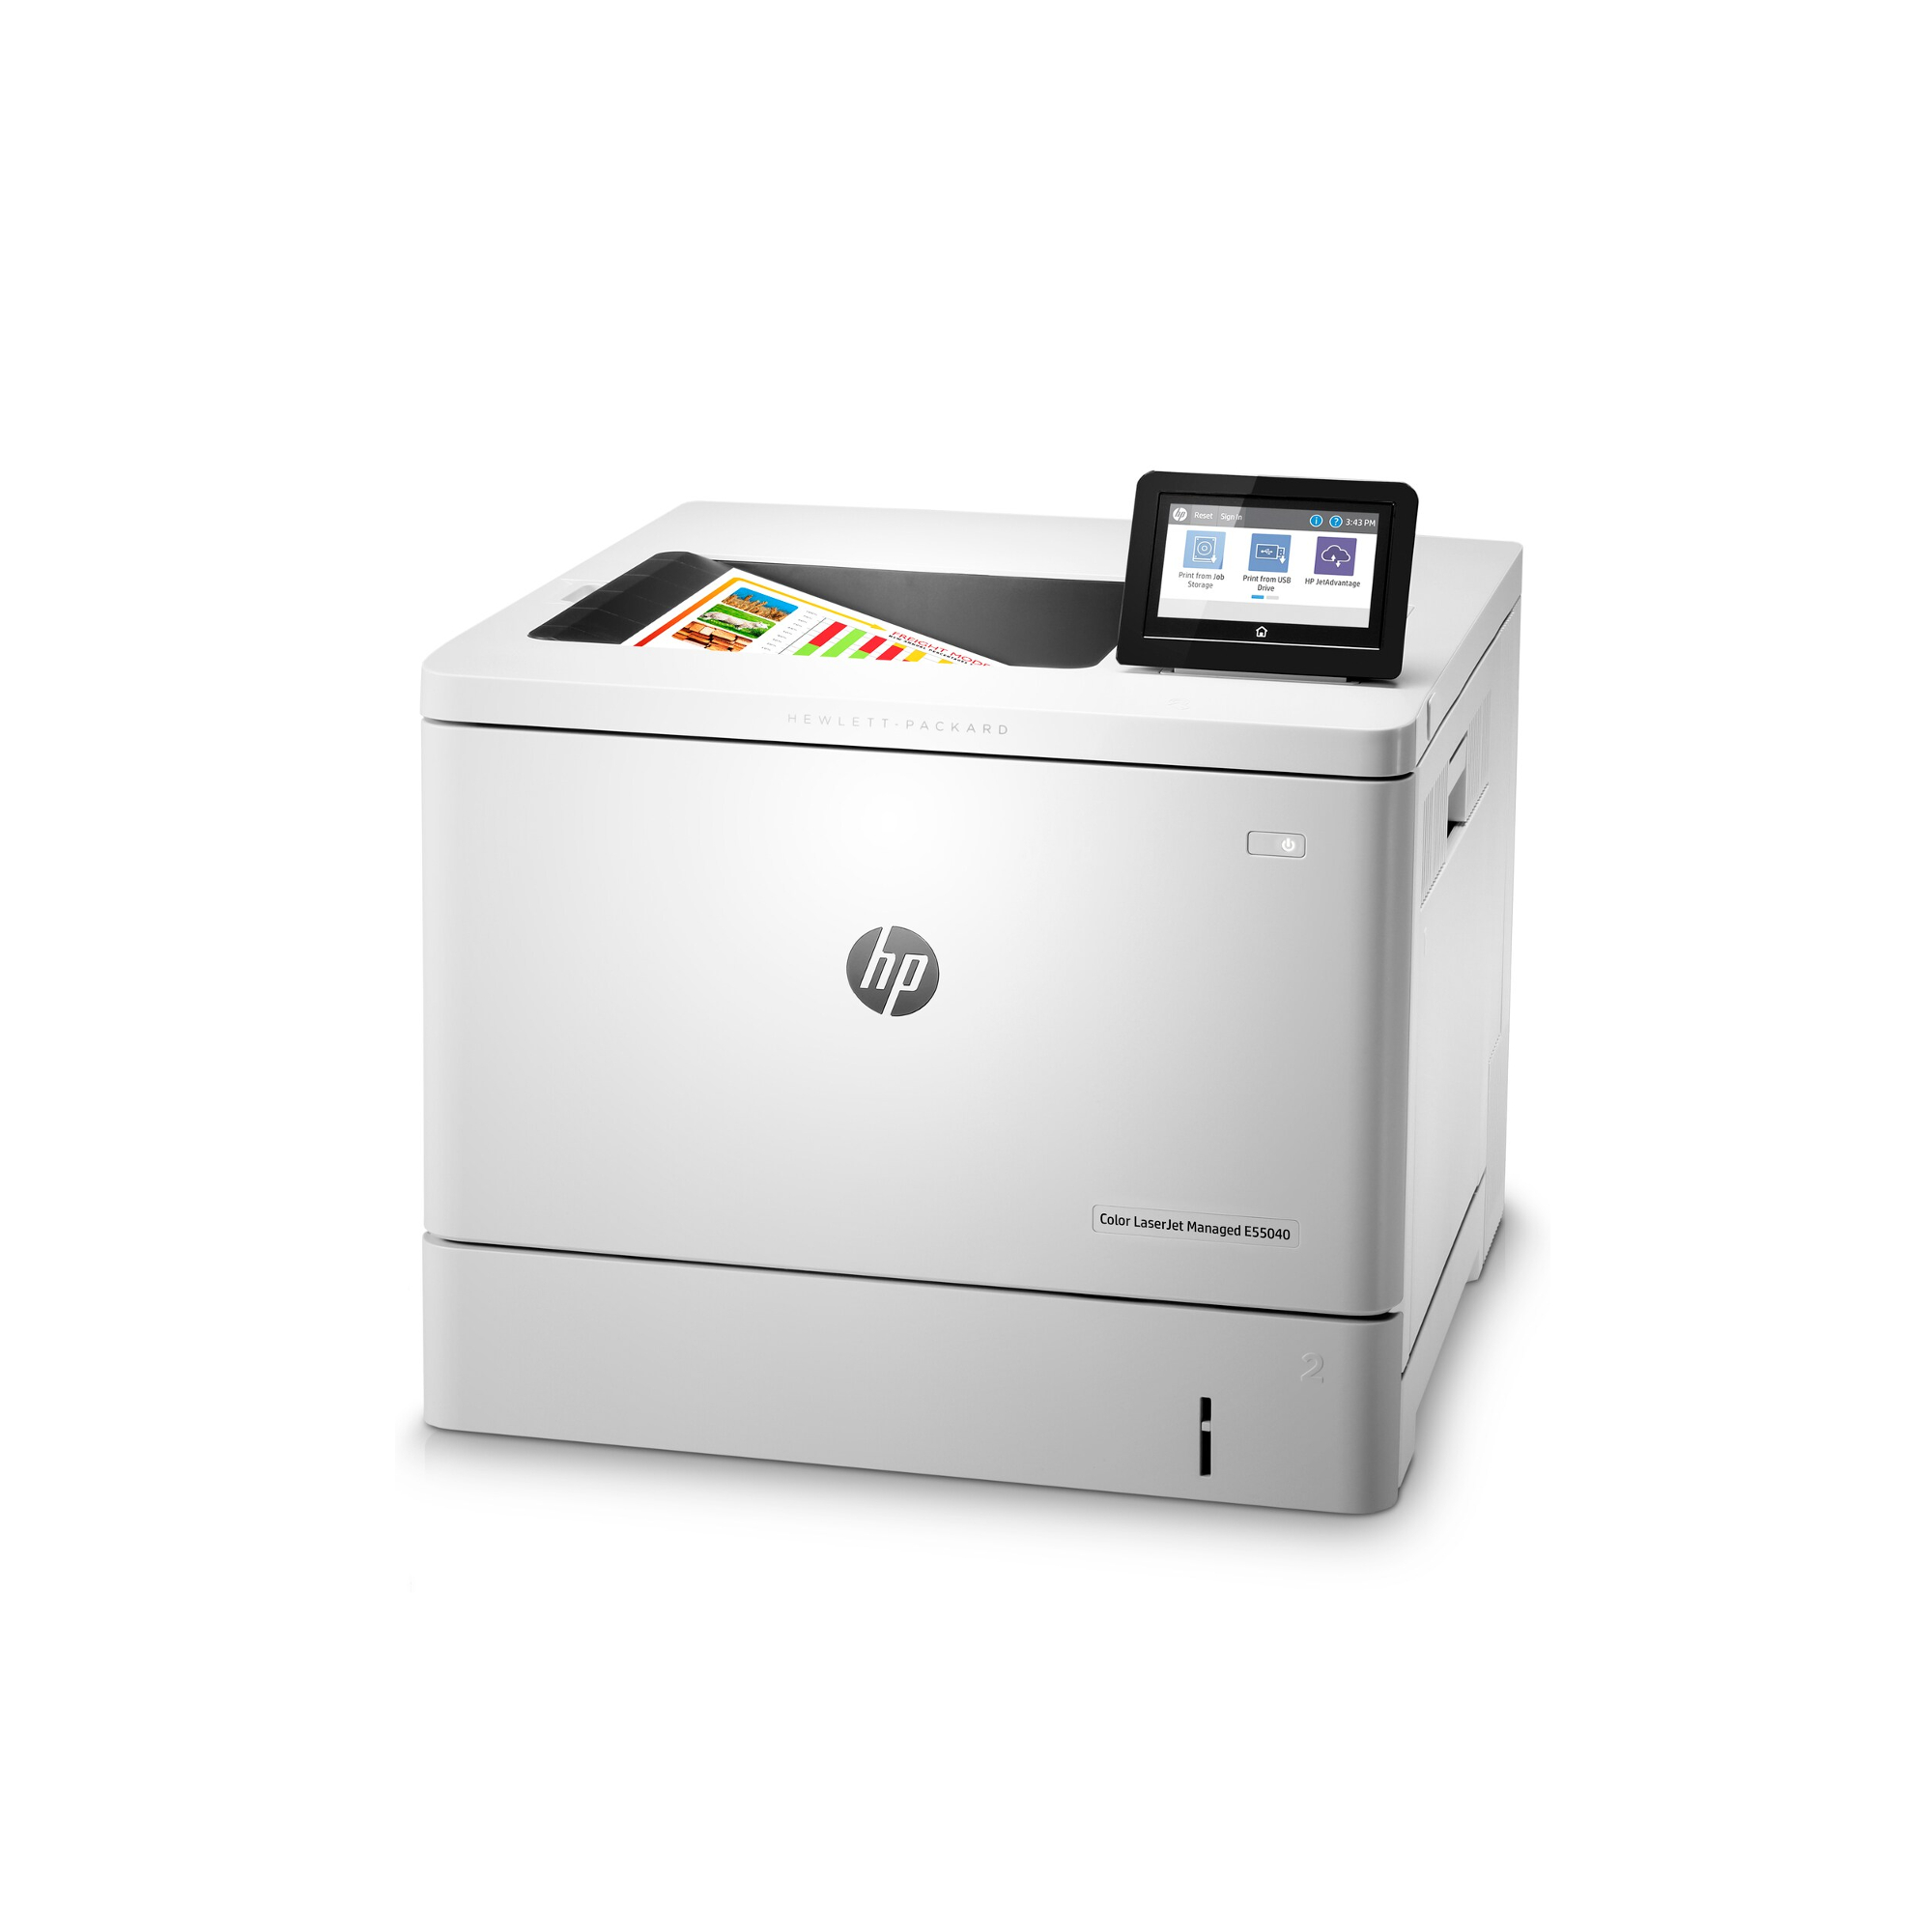 Noleggio Stampante HP Color LaserJet Managed E55040dw - Lyreco print services